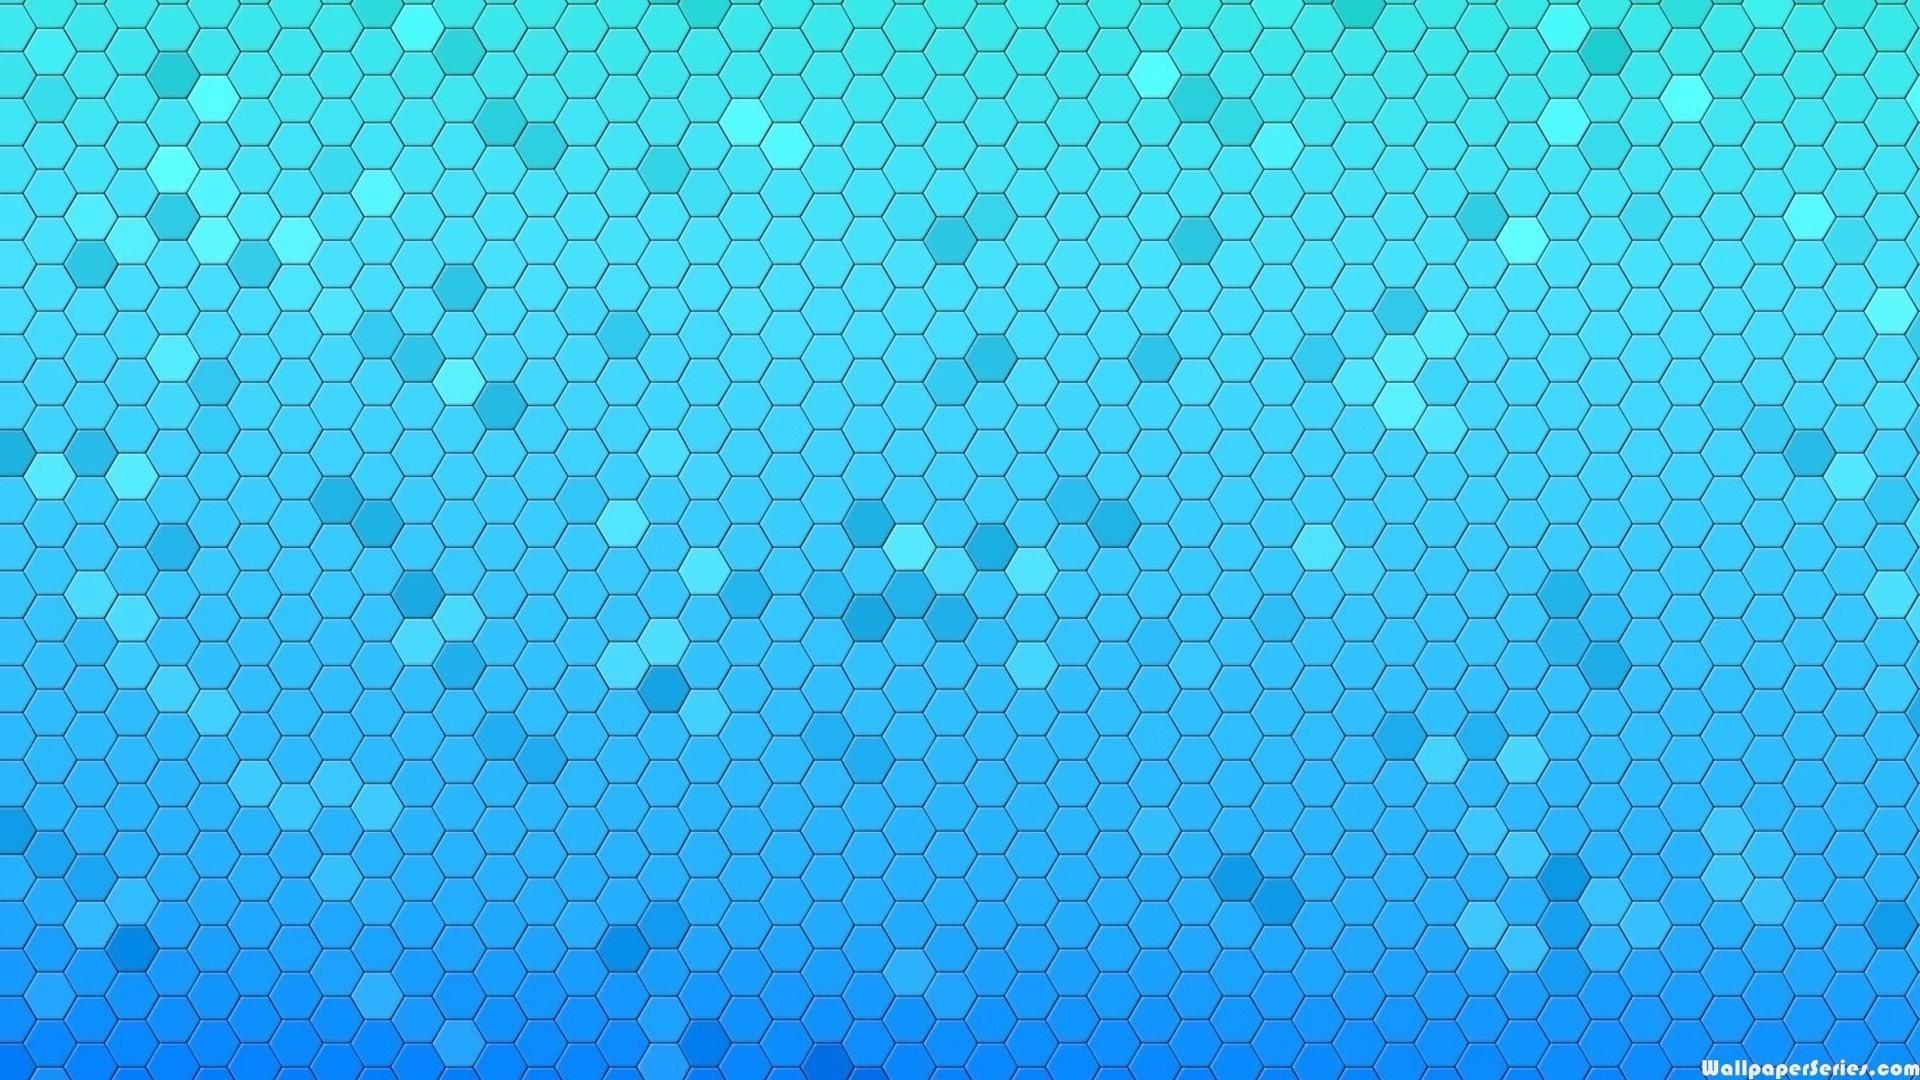 pattern background Google 검색 패턴 Pinterest